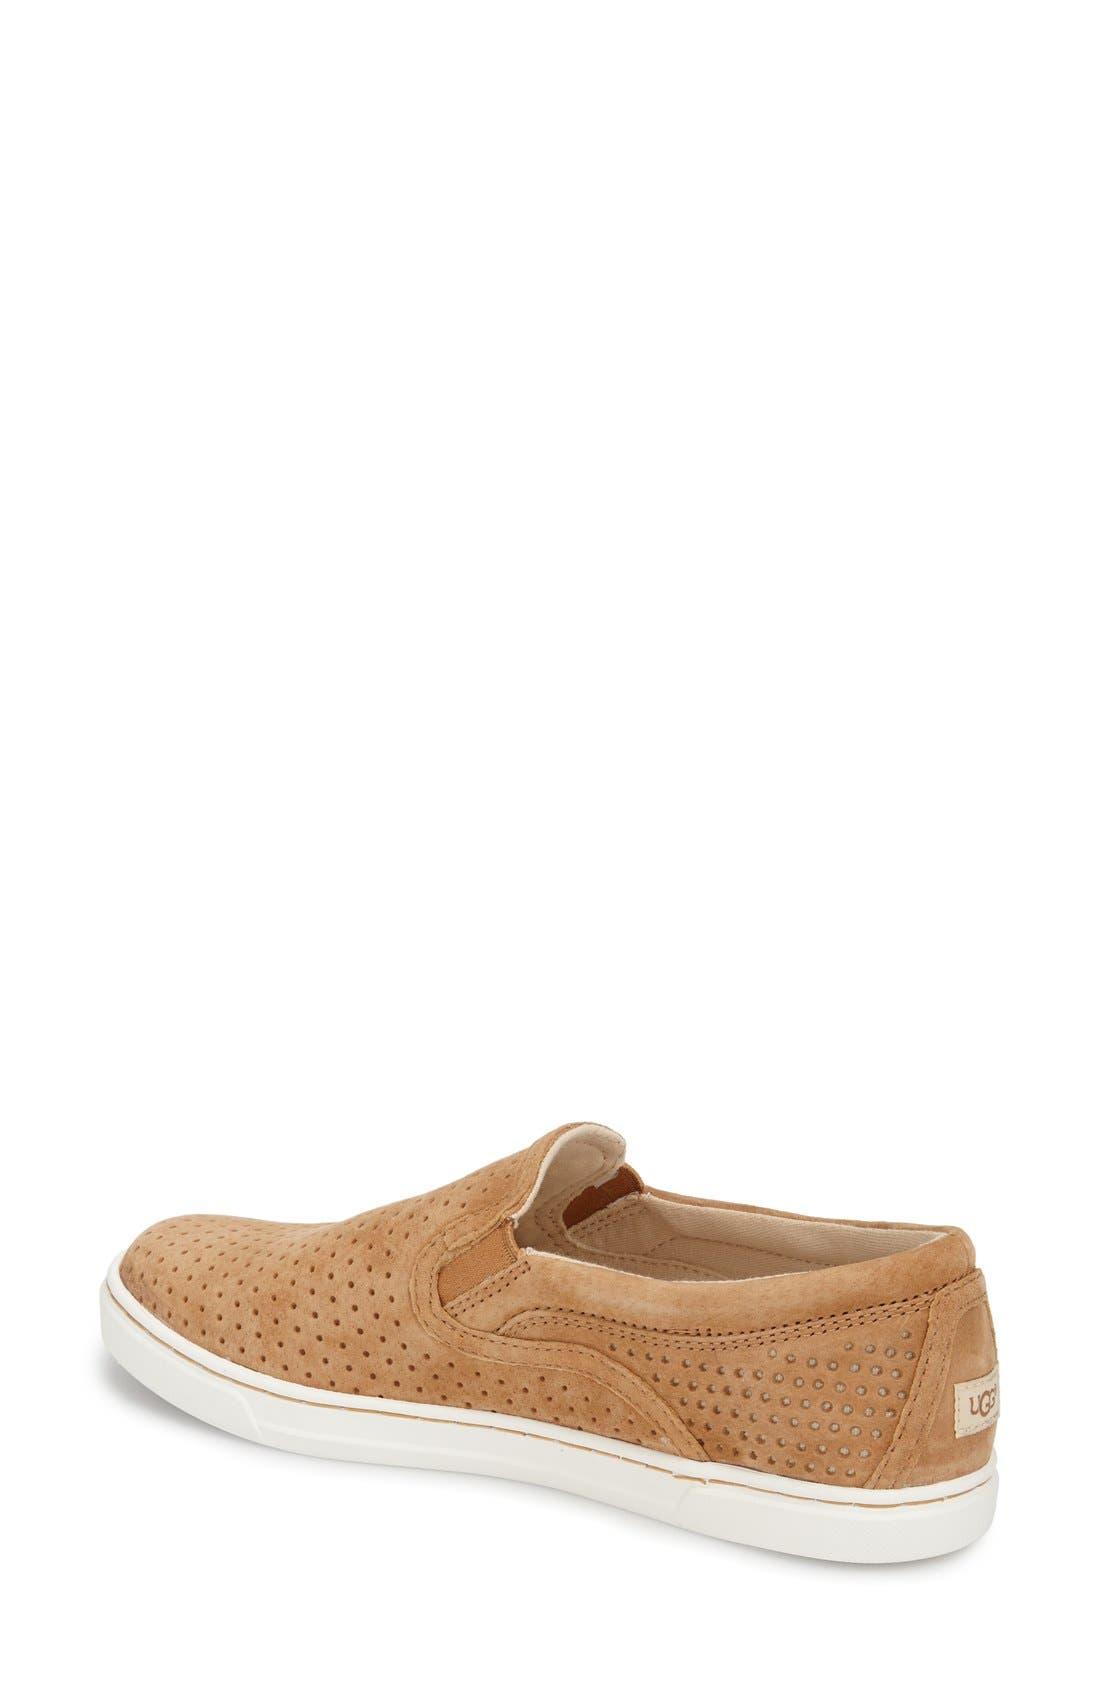 Alternate Image 2  - UGG® 'Fierce Geo' Perforated Slip-On Sneaker (Women)